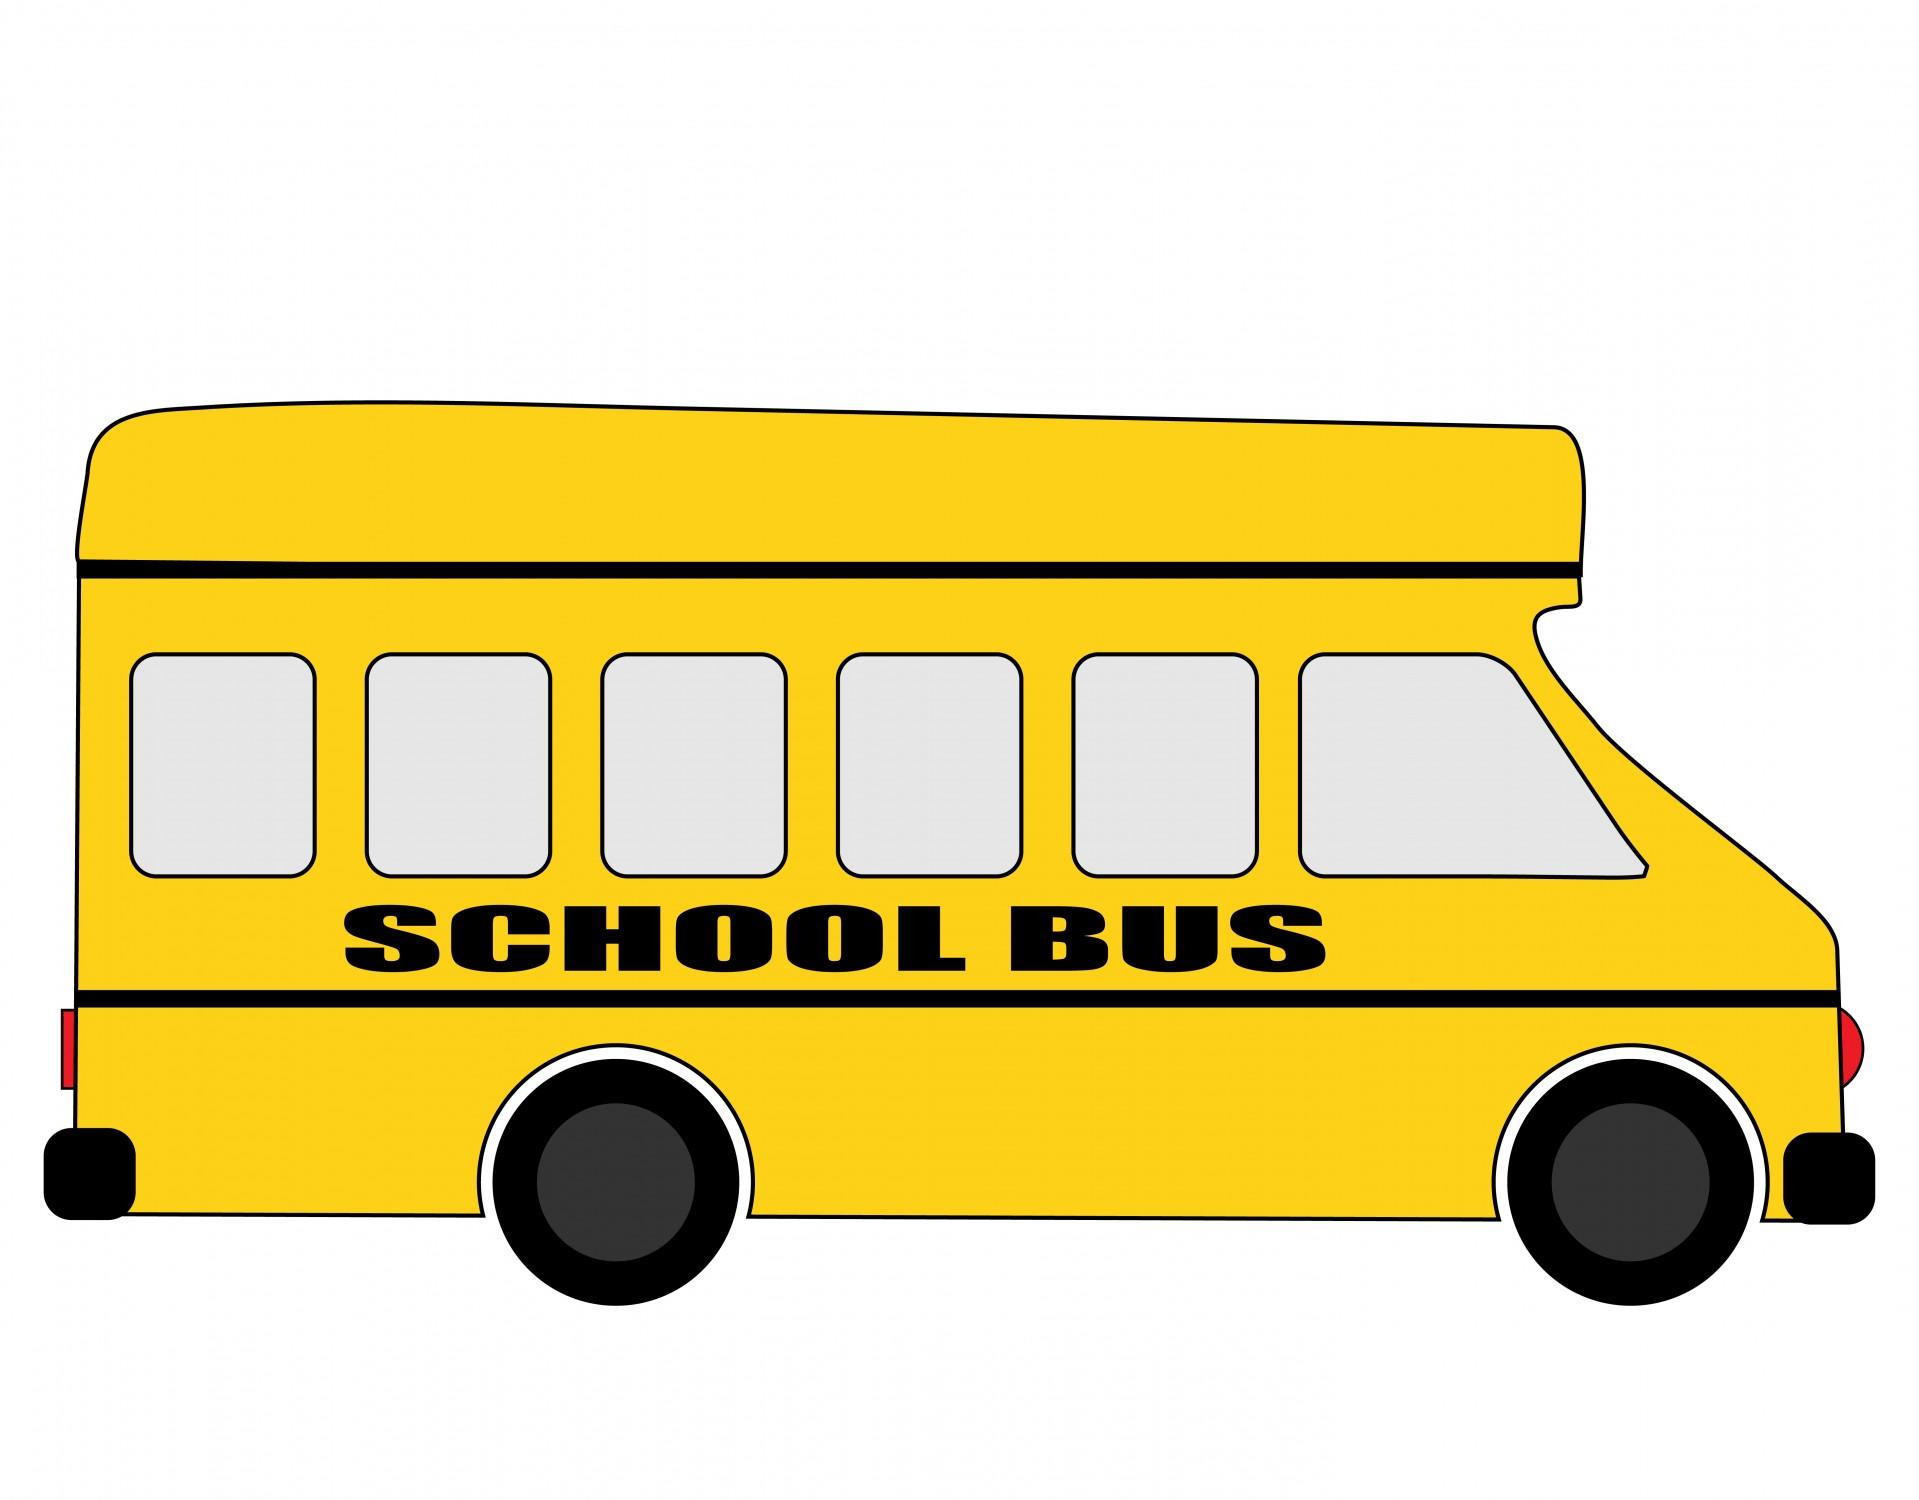 School bus,bus,transport,yellow,clipart.